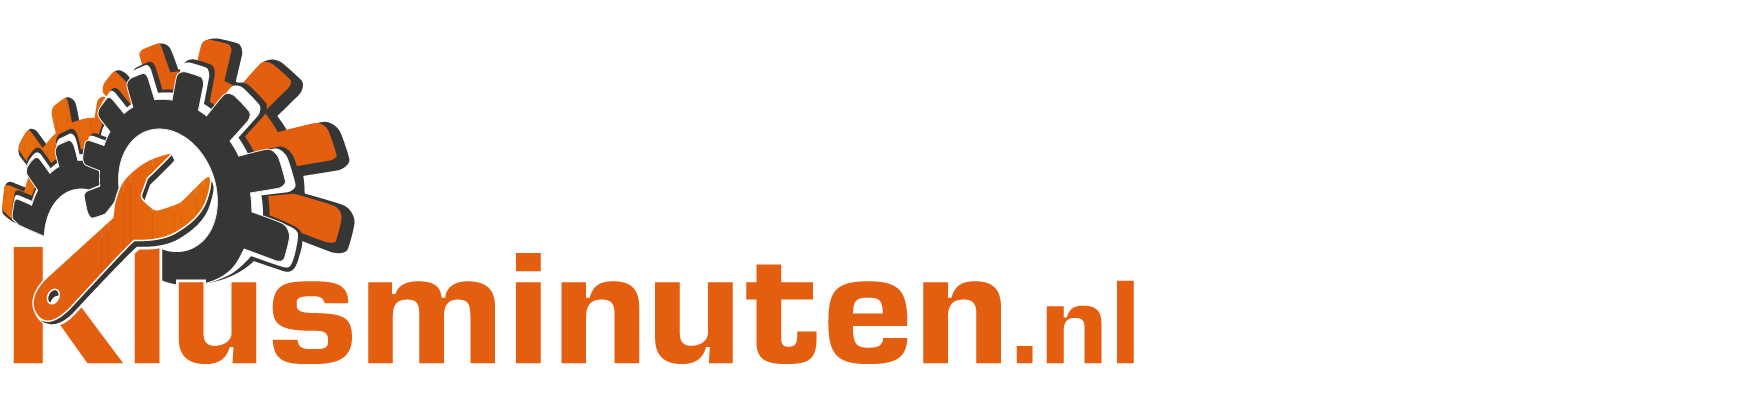 Klusminuten.nl